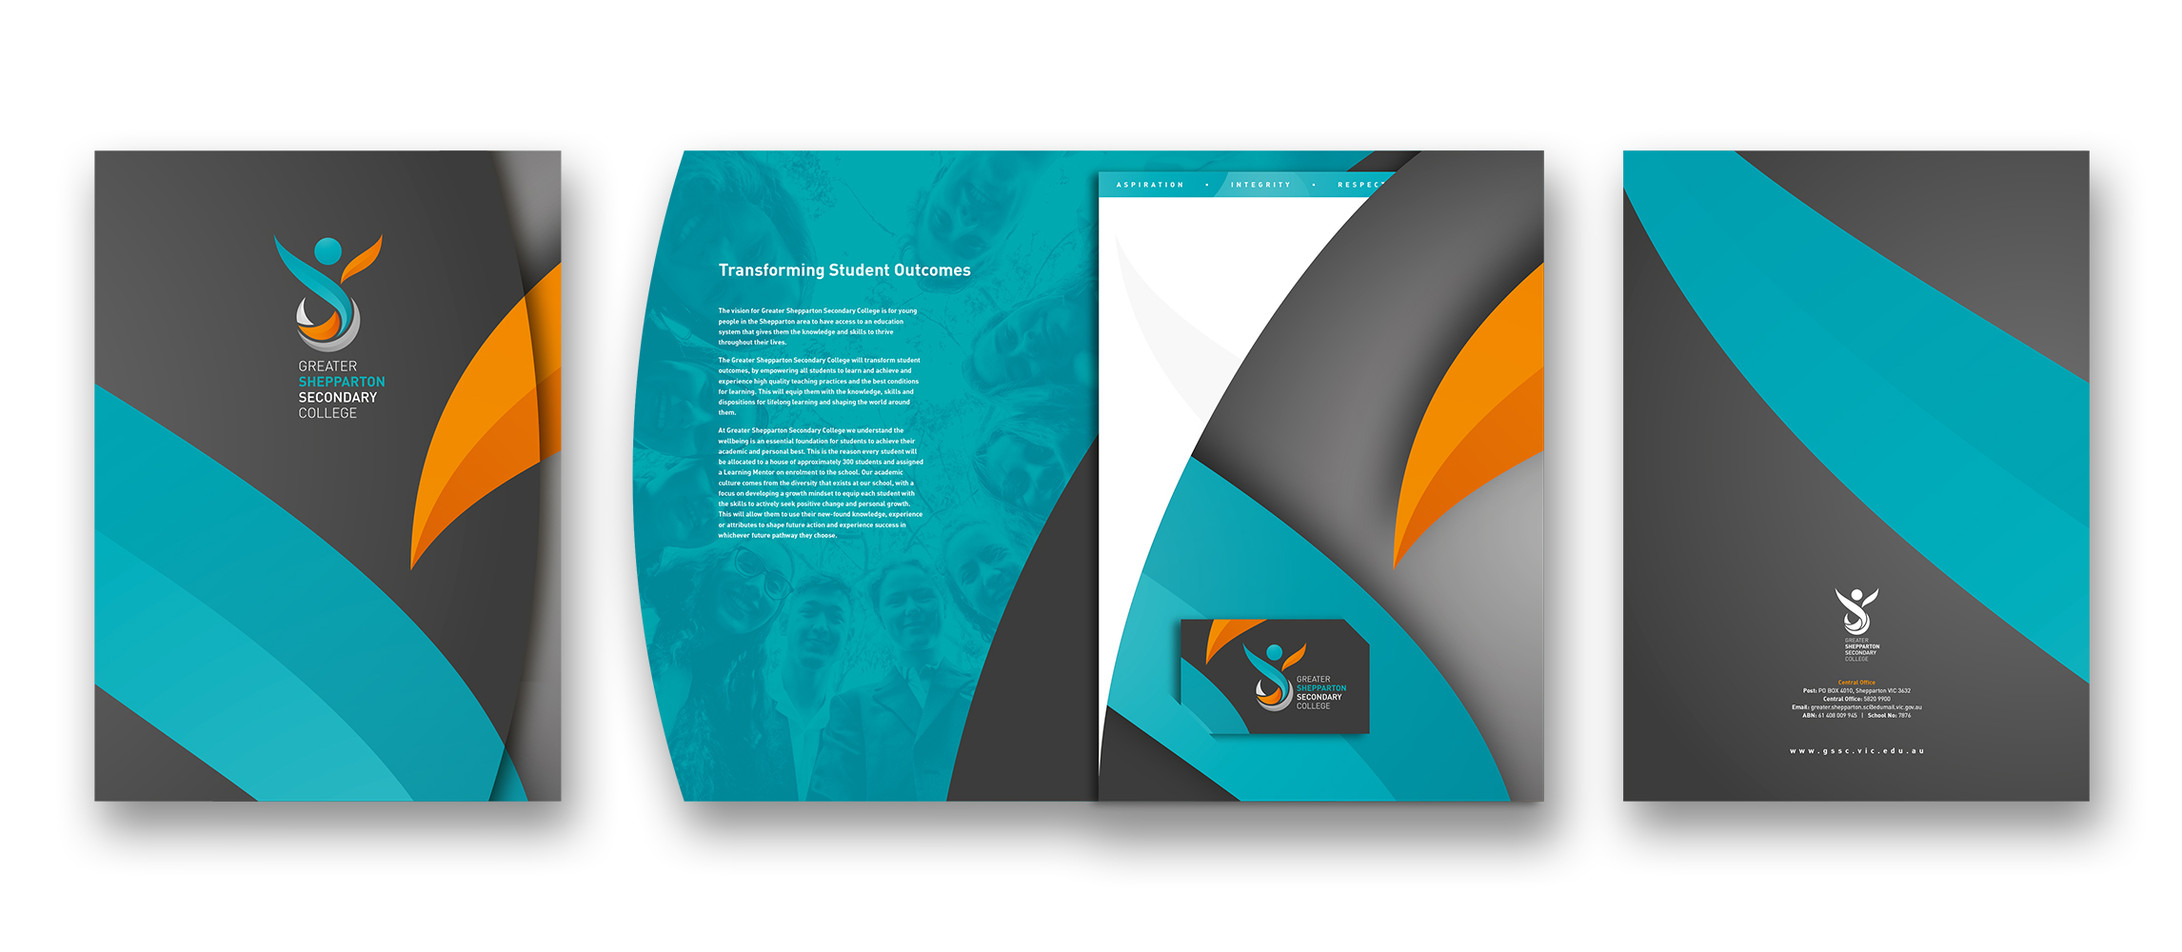 GSSC_Branding_Collateral_1.jpg